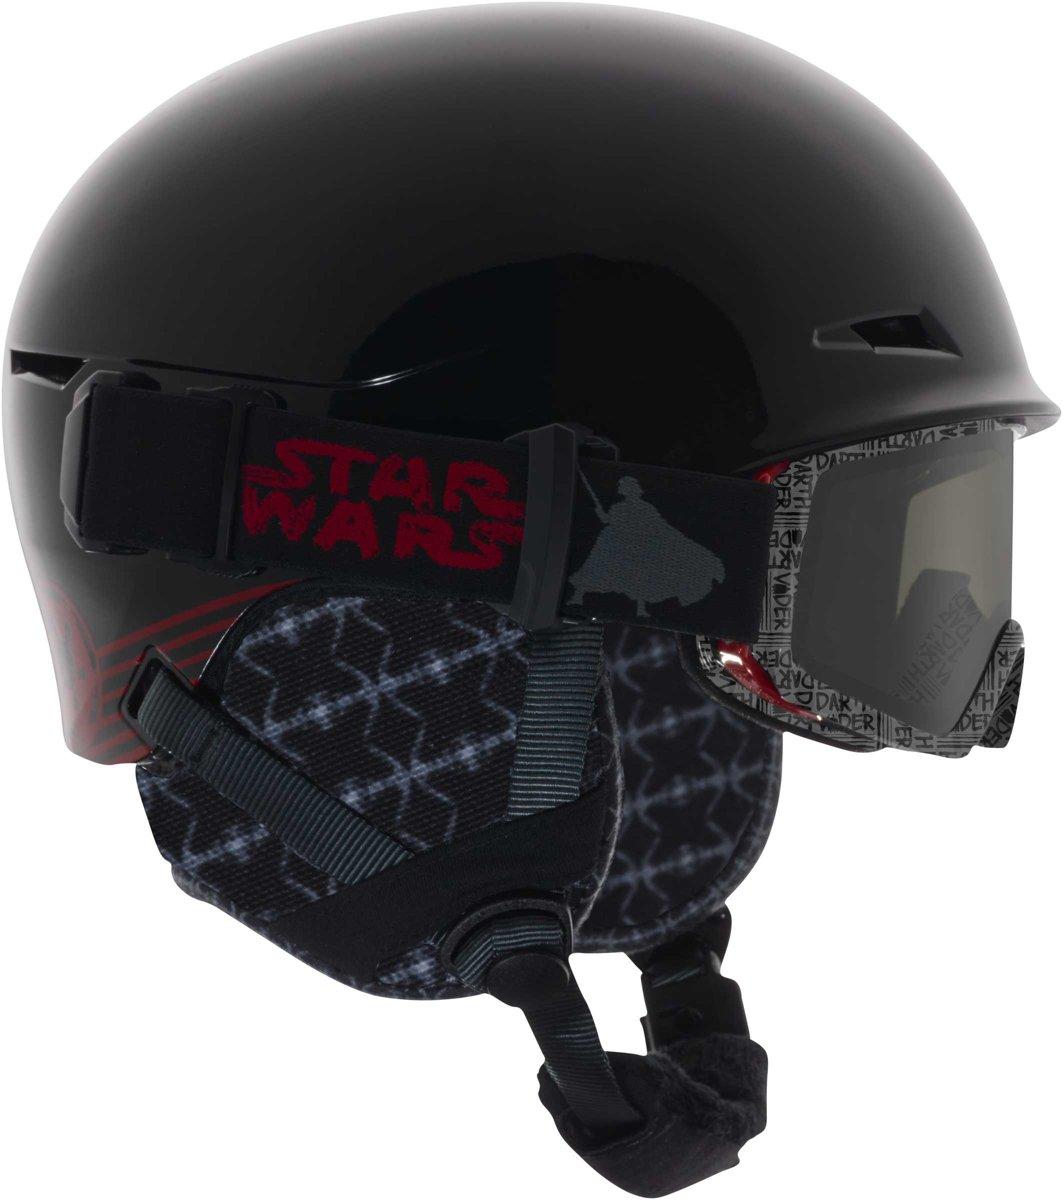 Anon Jongens Skihelm met skibril - Define Darth Vader L kopen